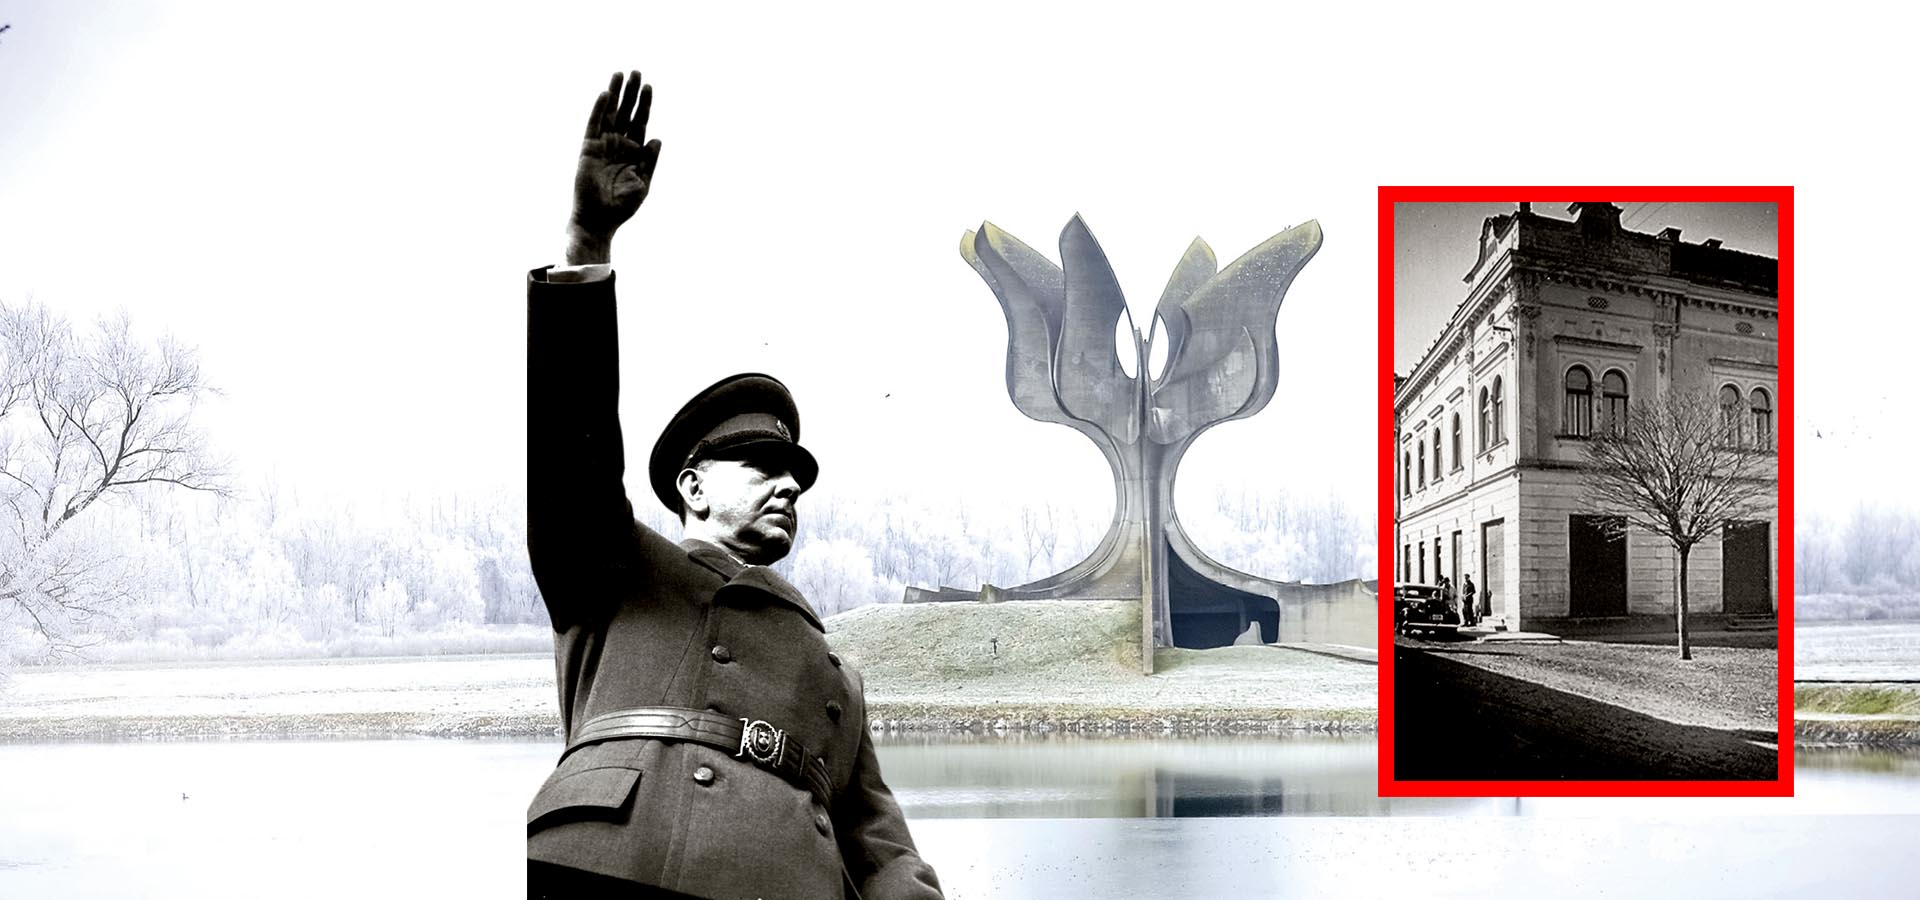 EKSKLUZIVNO 'SPOMEN-PLOČA HOS-a na mjestu je Luburićeva stožera logora Jasenovac'